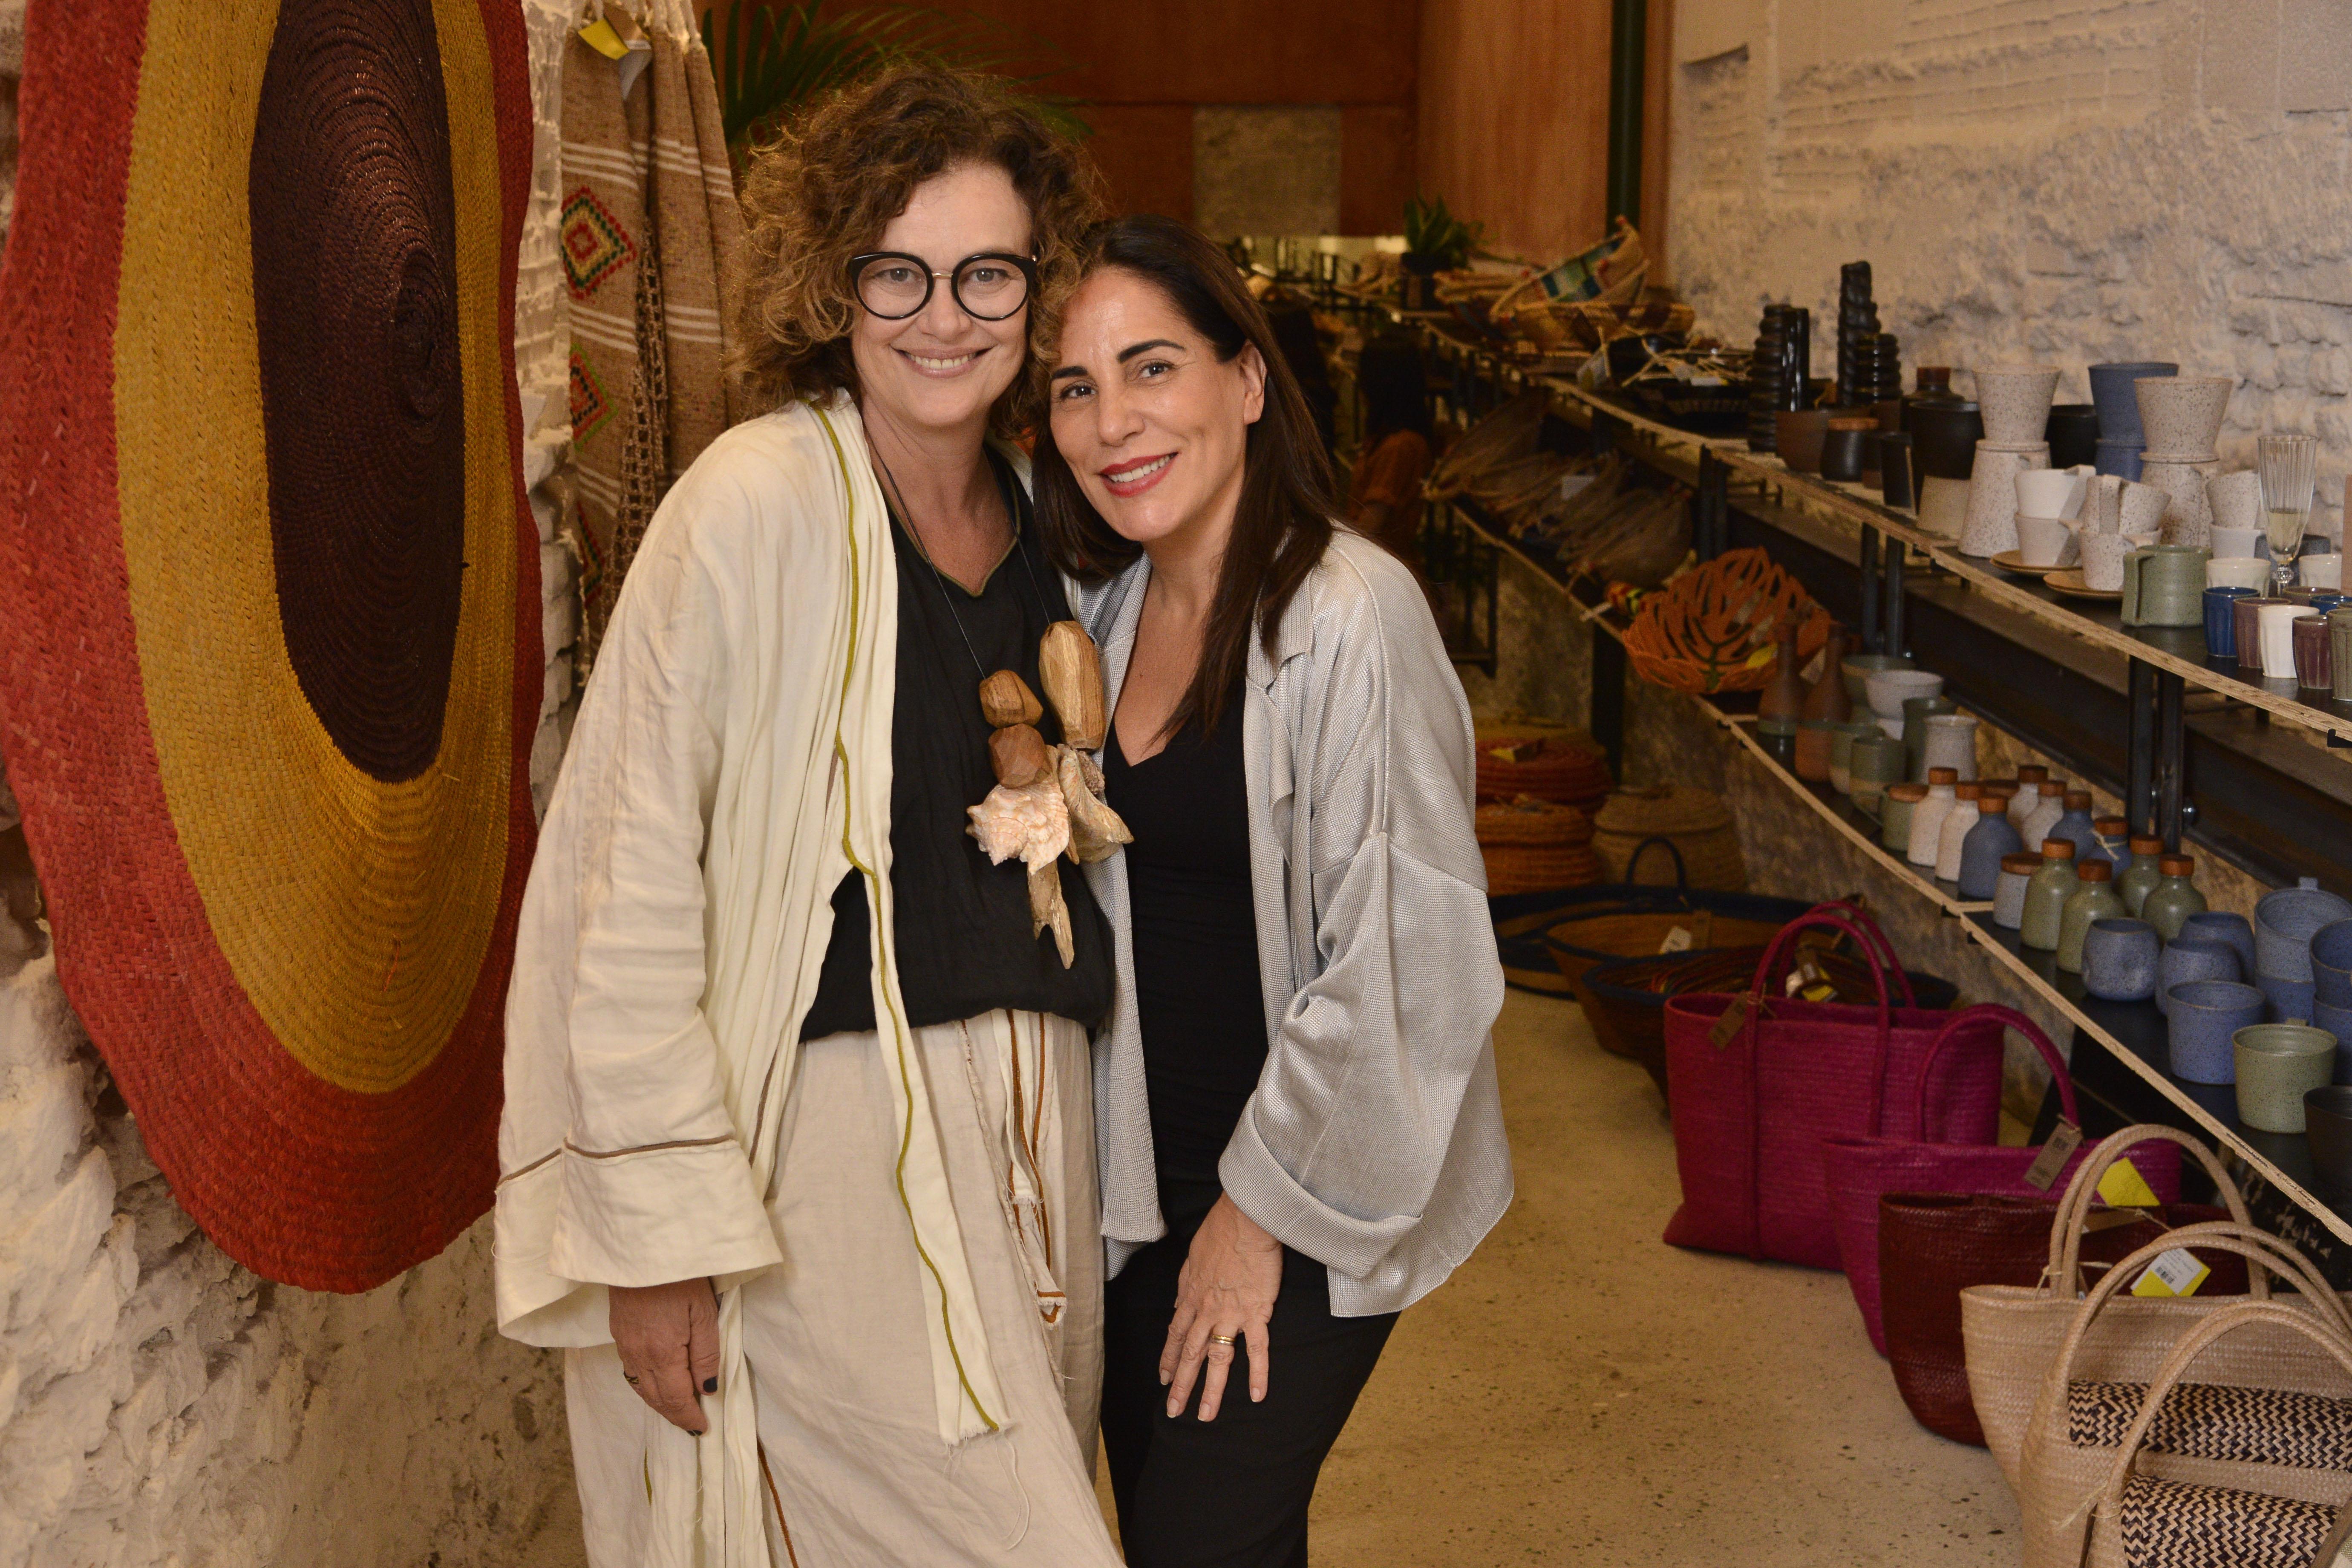 Betty Prado e Glória Pires na entrada da loja Bemglô / Foto: João Sal